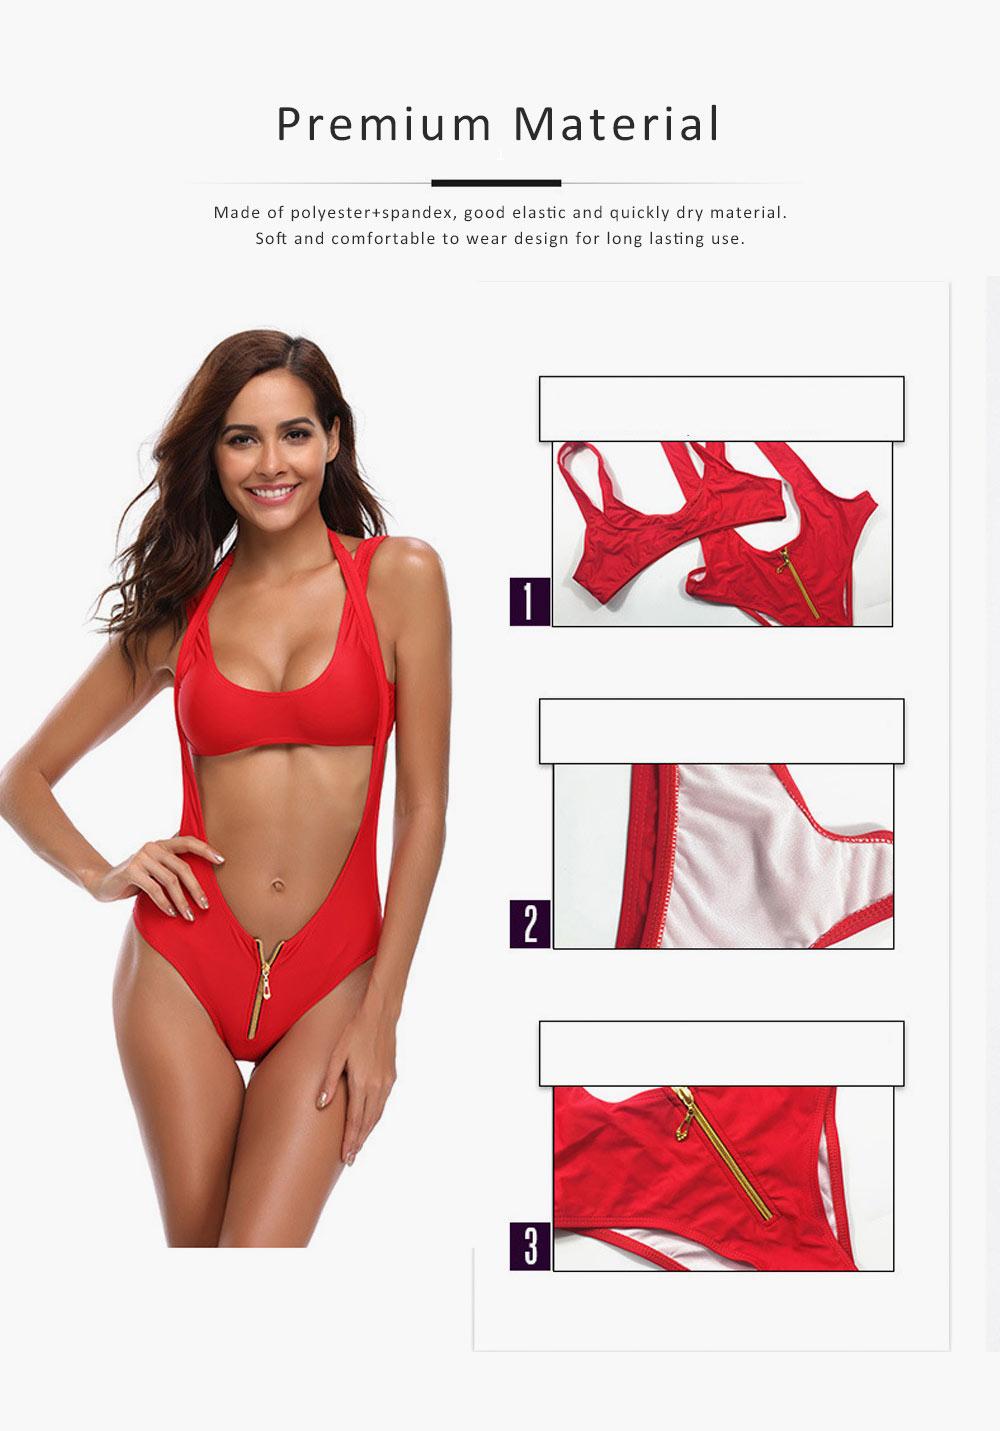 Women's Swimsuit Zipper Front High Waist High Cut Two Piece Bikini Sets Fashion Sexy Beachwear 2